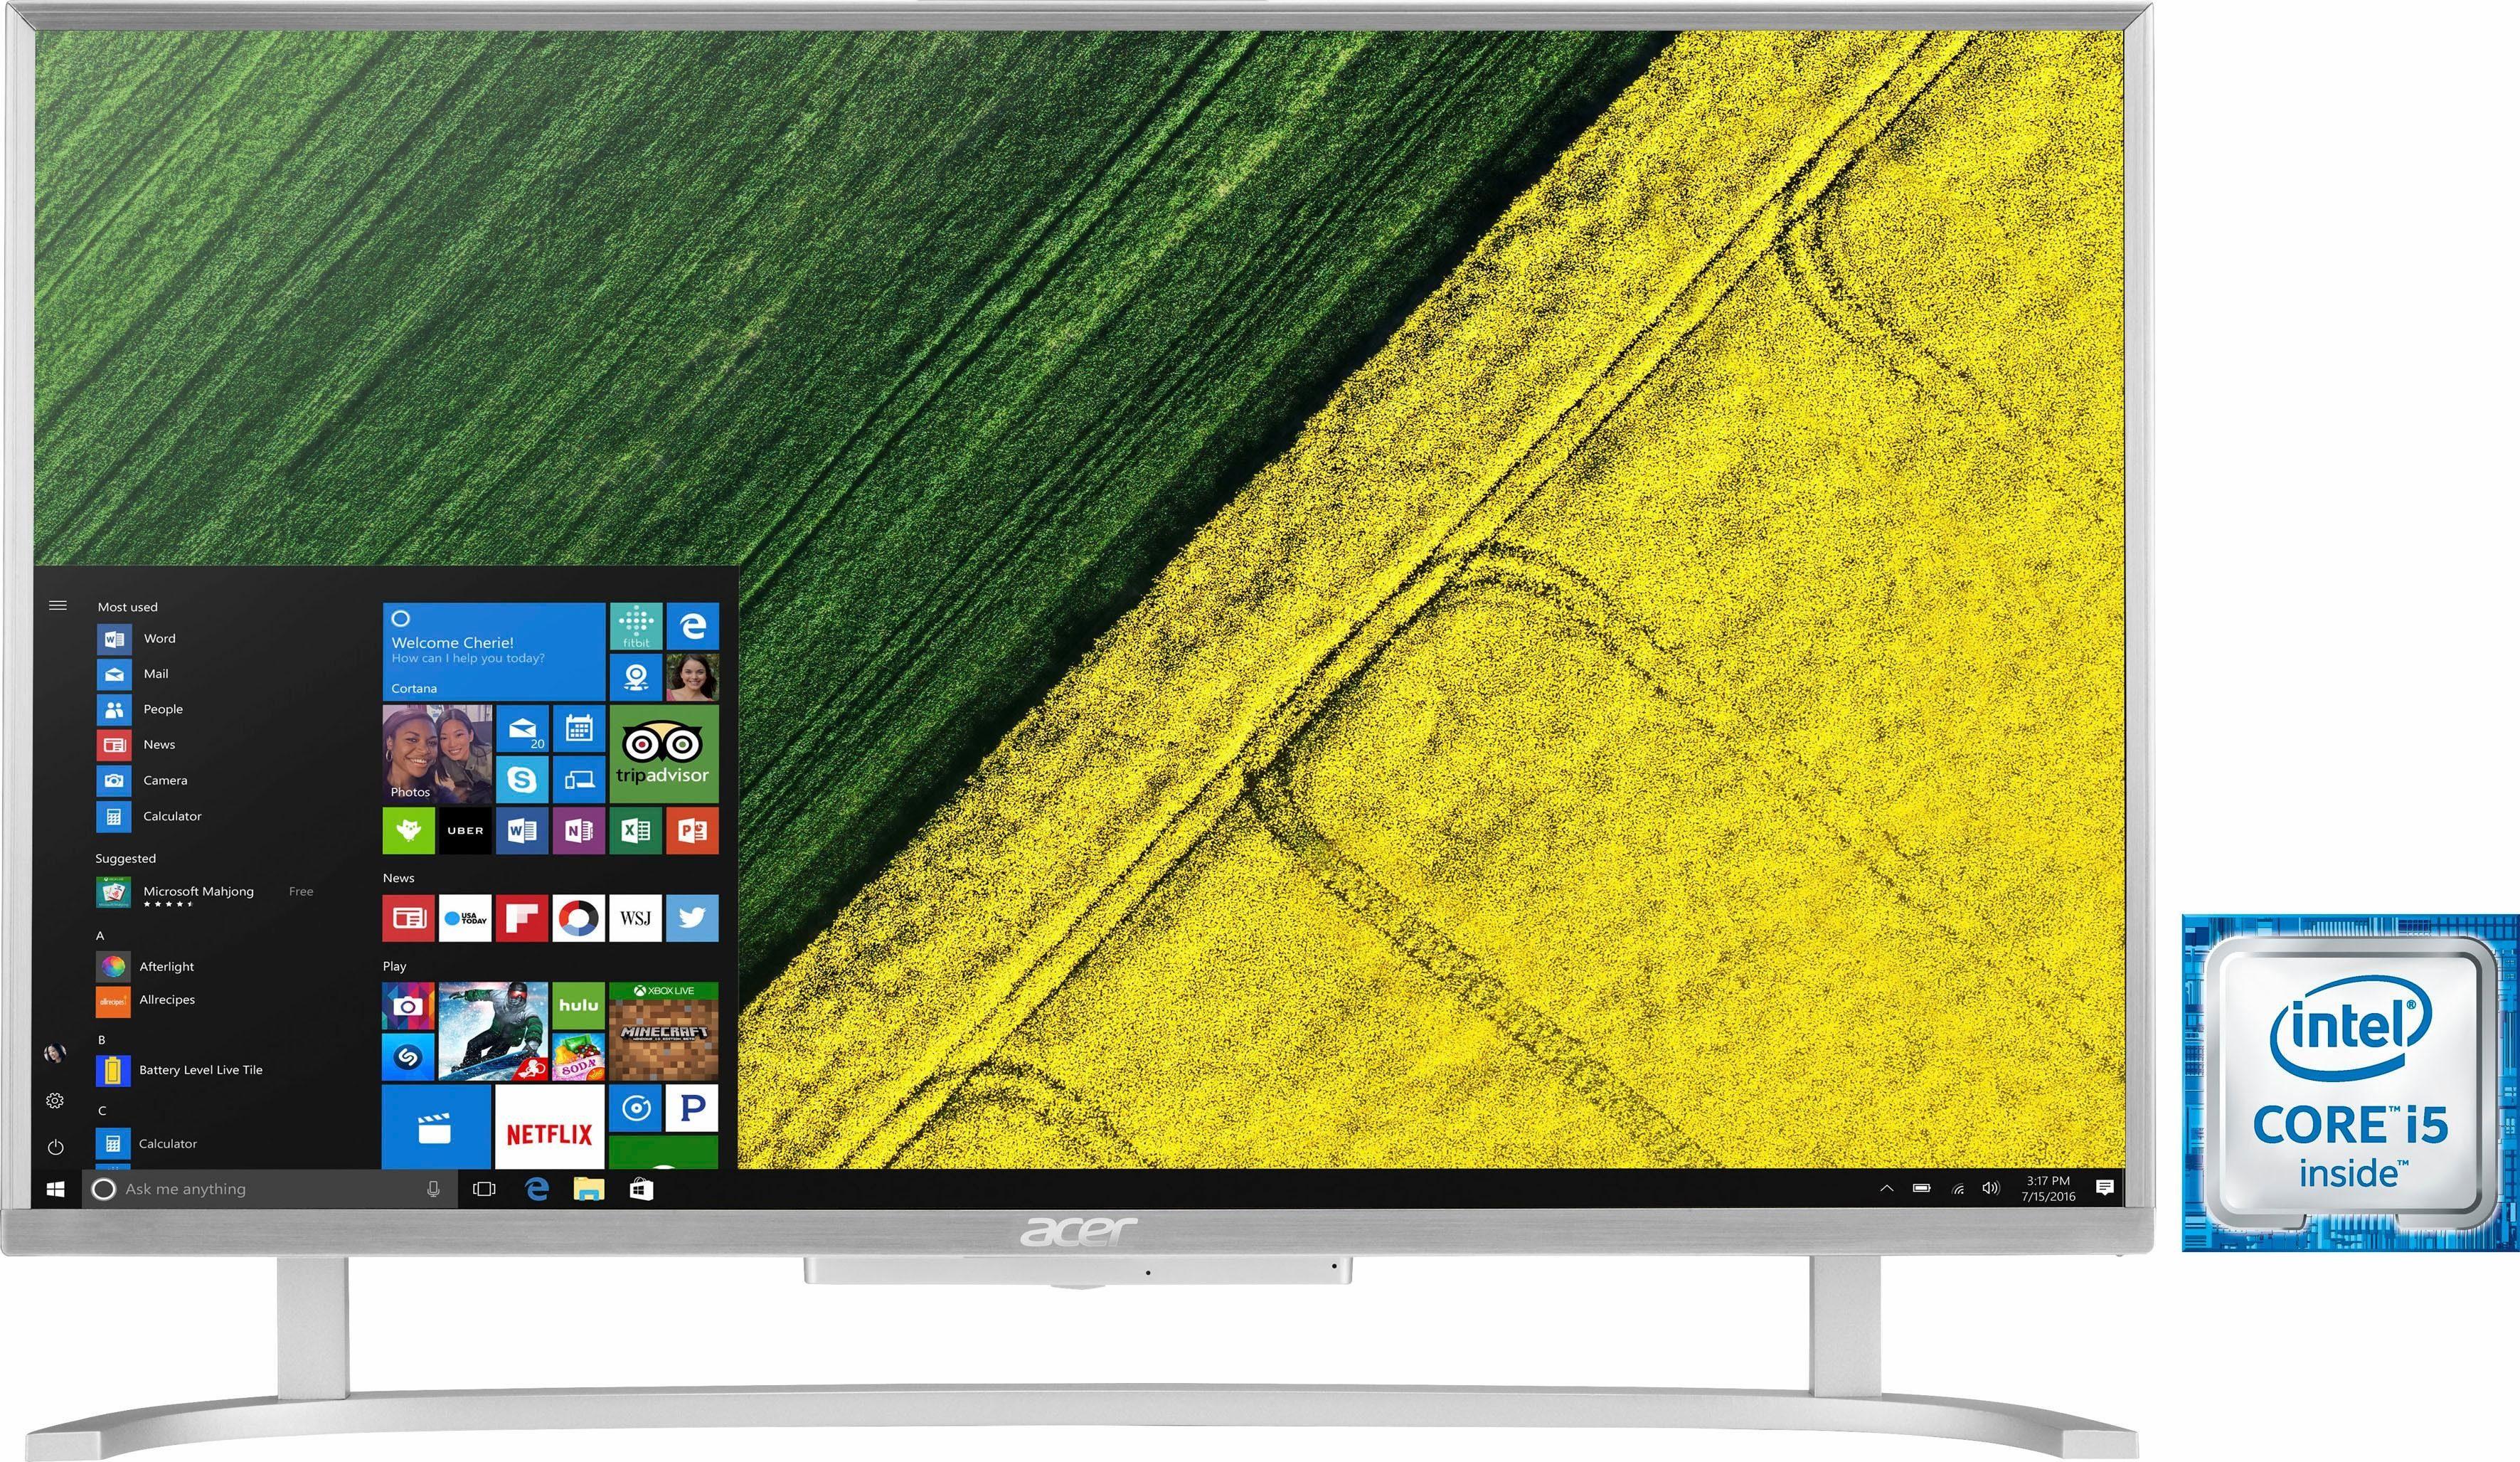 Acer Aspire C24-760 60,5 cm (23,8 Zoll) PC, Intel® Core™ i5, 8192 MB DDR4, 1000 GB Speicher